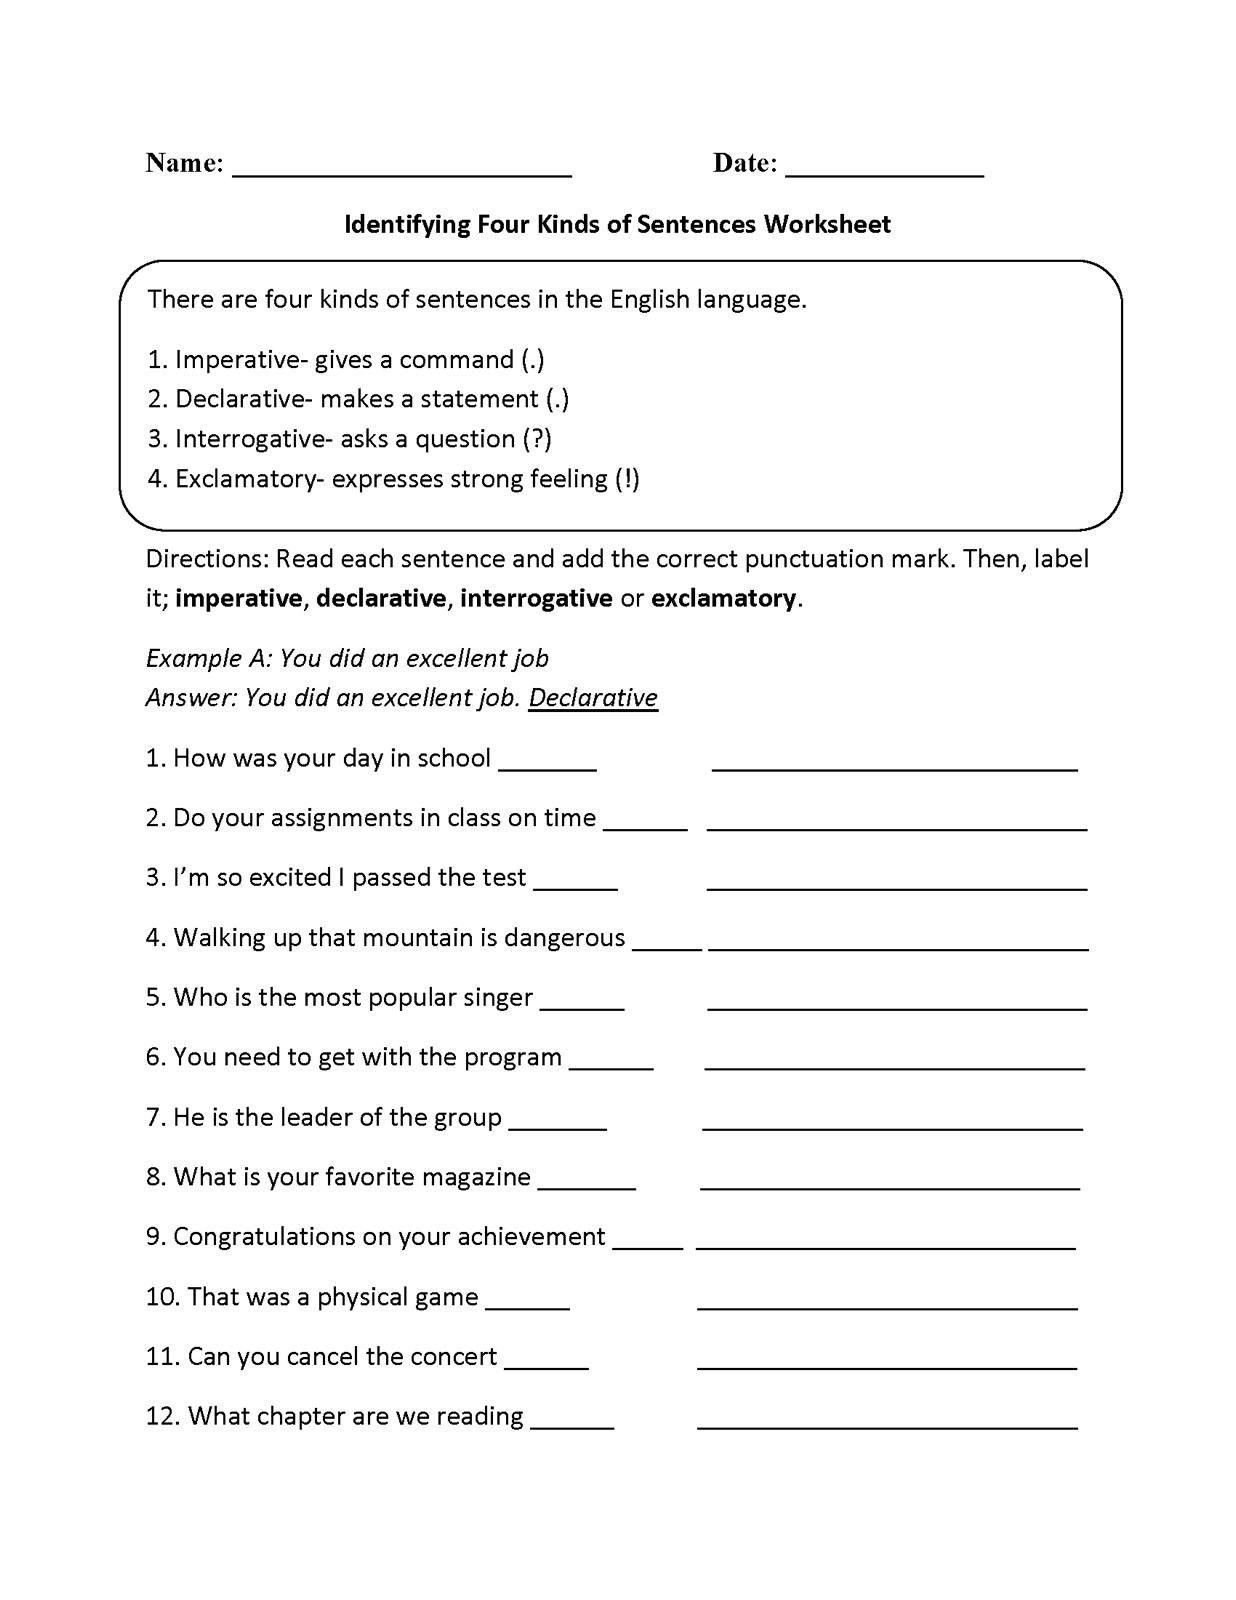 Pin By Queniz Torres On Anexis Complex Sentences Worksheets Types Of Sentences Worksheet Types Of Sentences